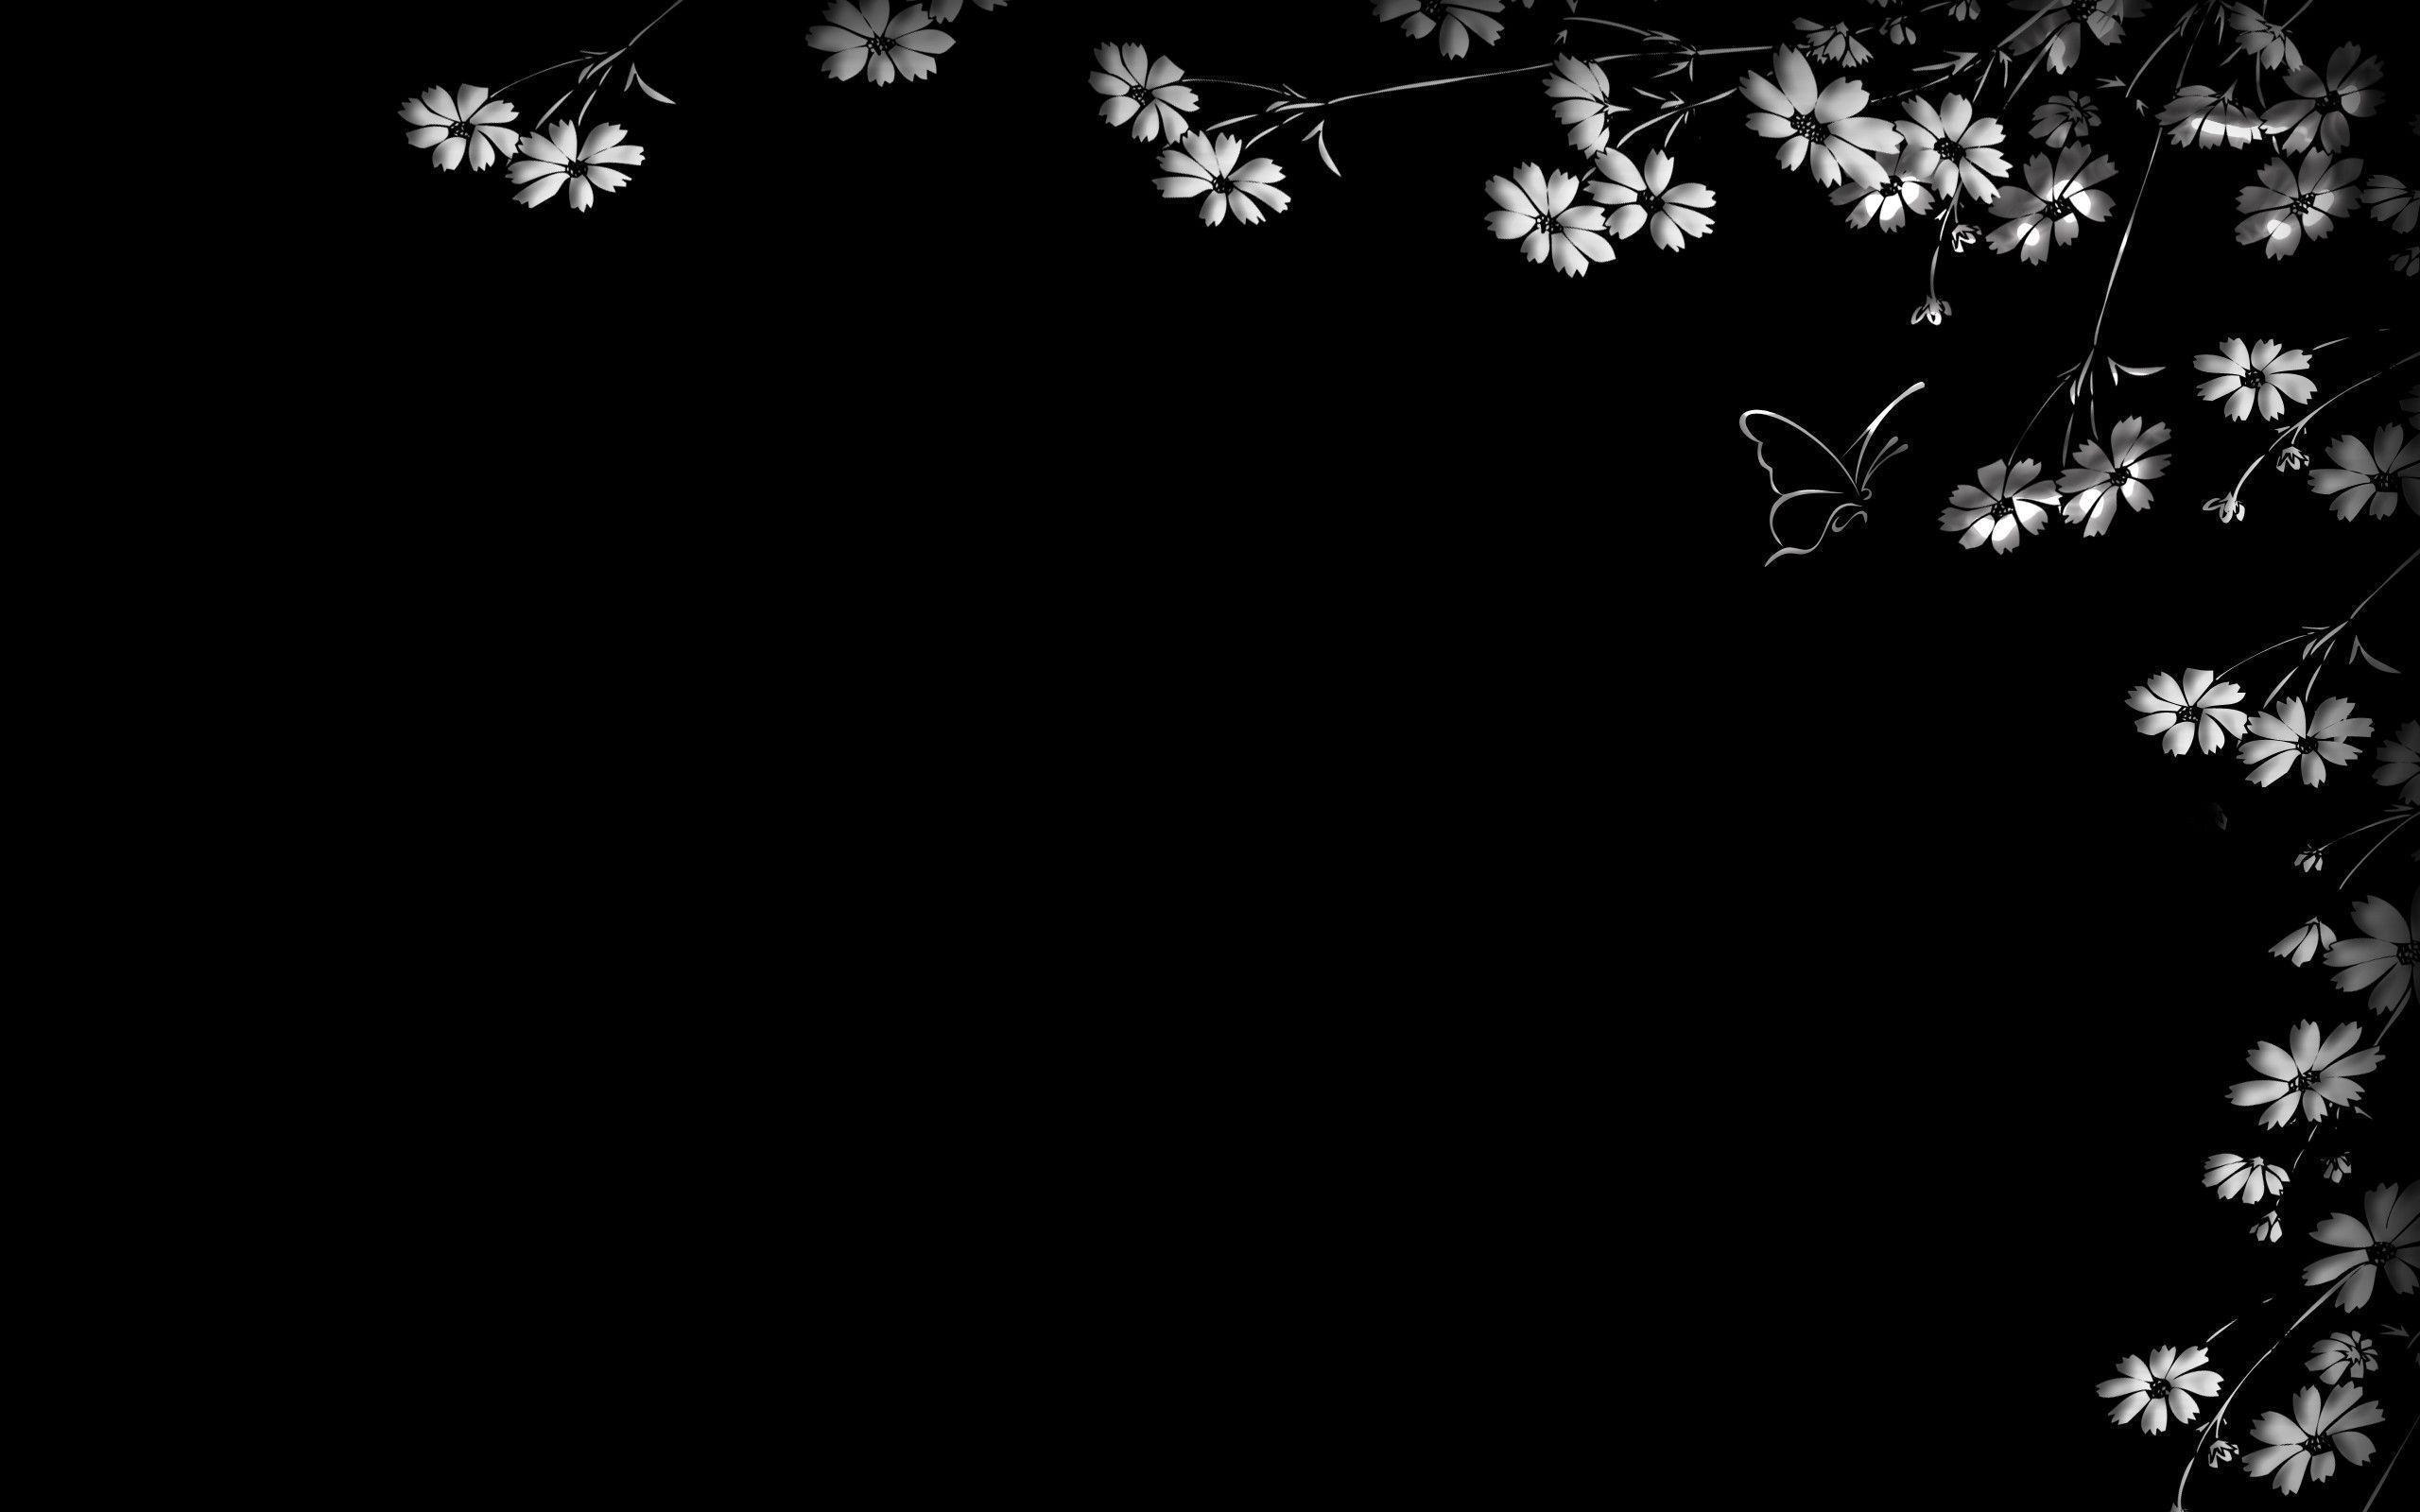 black backgrounds wallpapers wallpaper